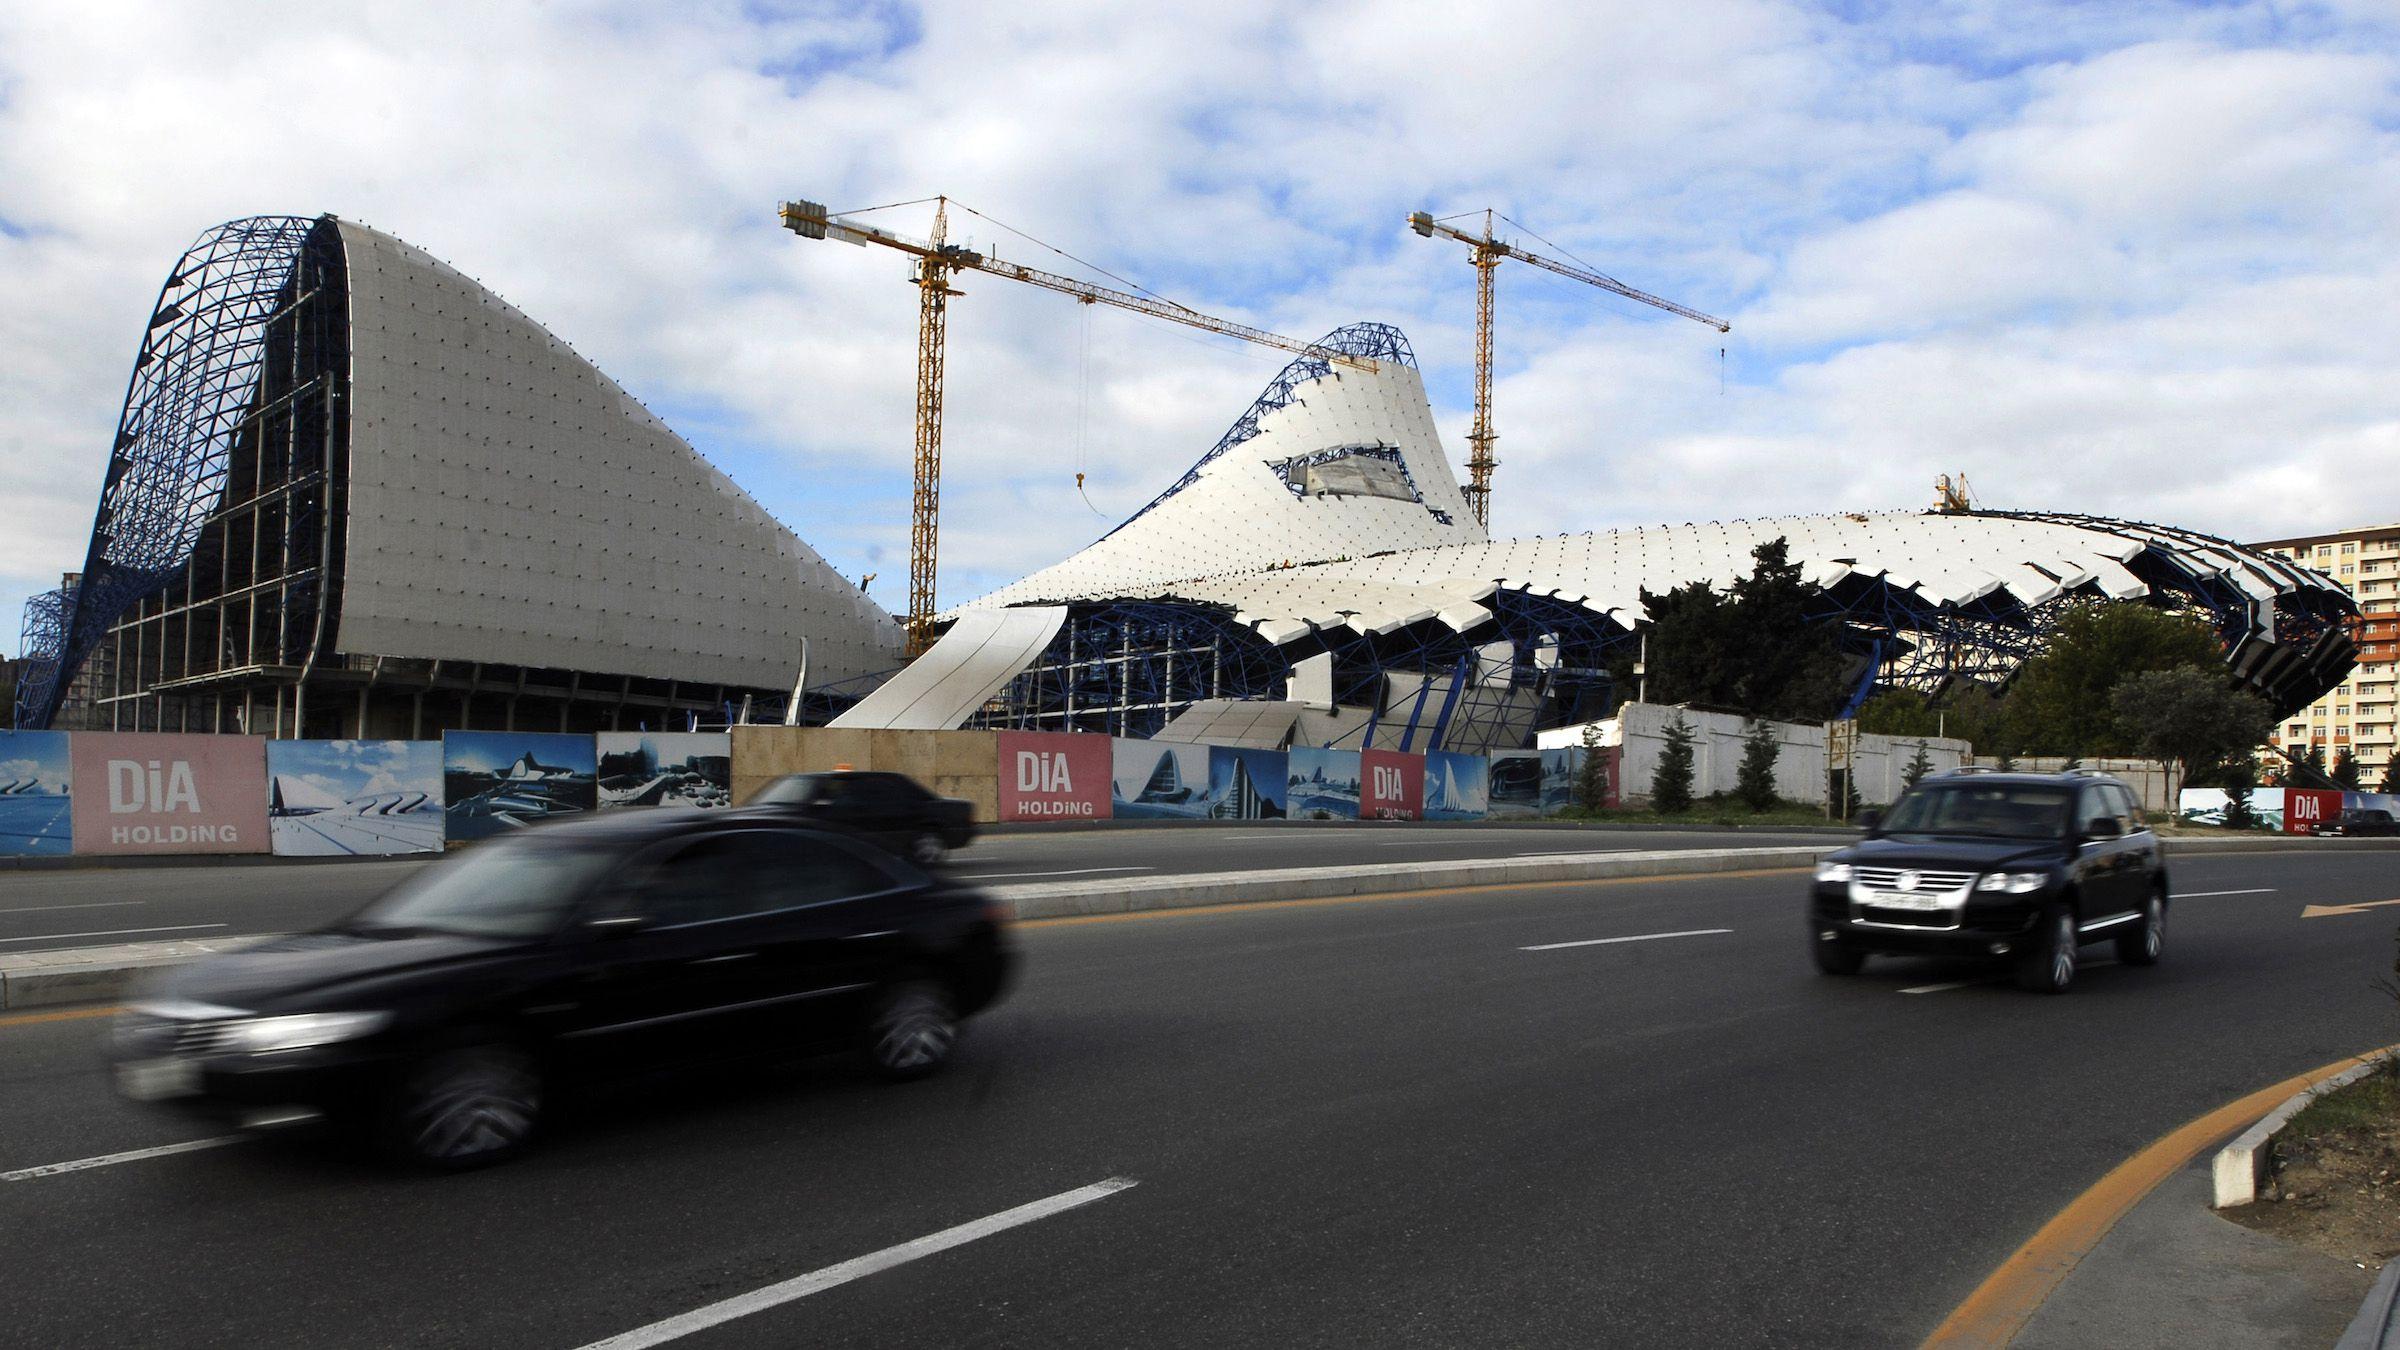 Zaha Hadid's Heydar Aliyev Center under construction